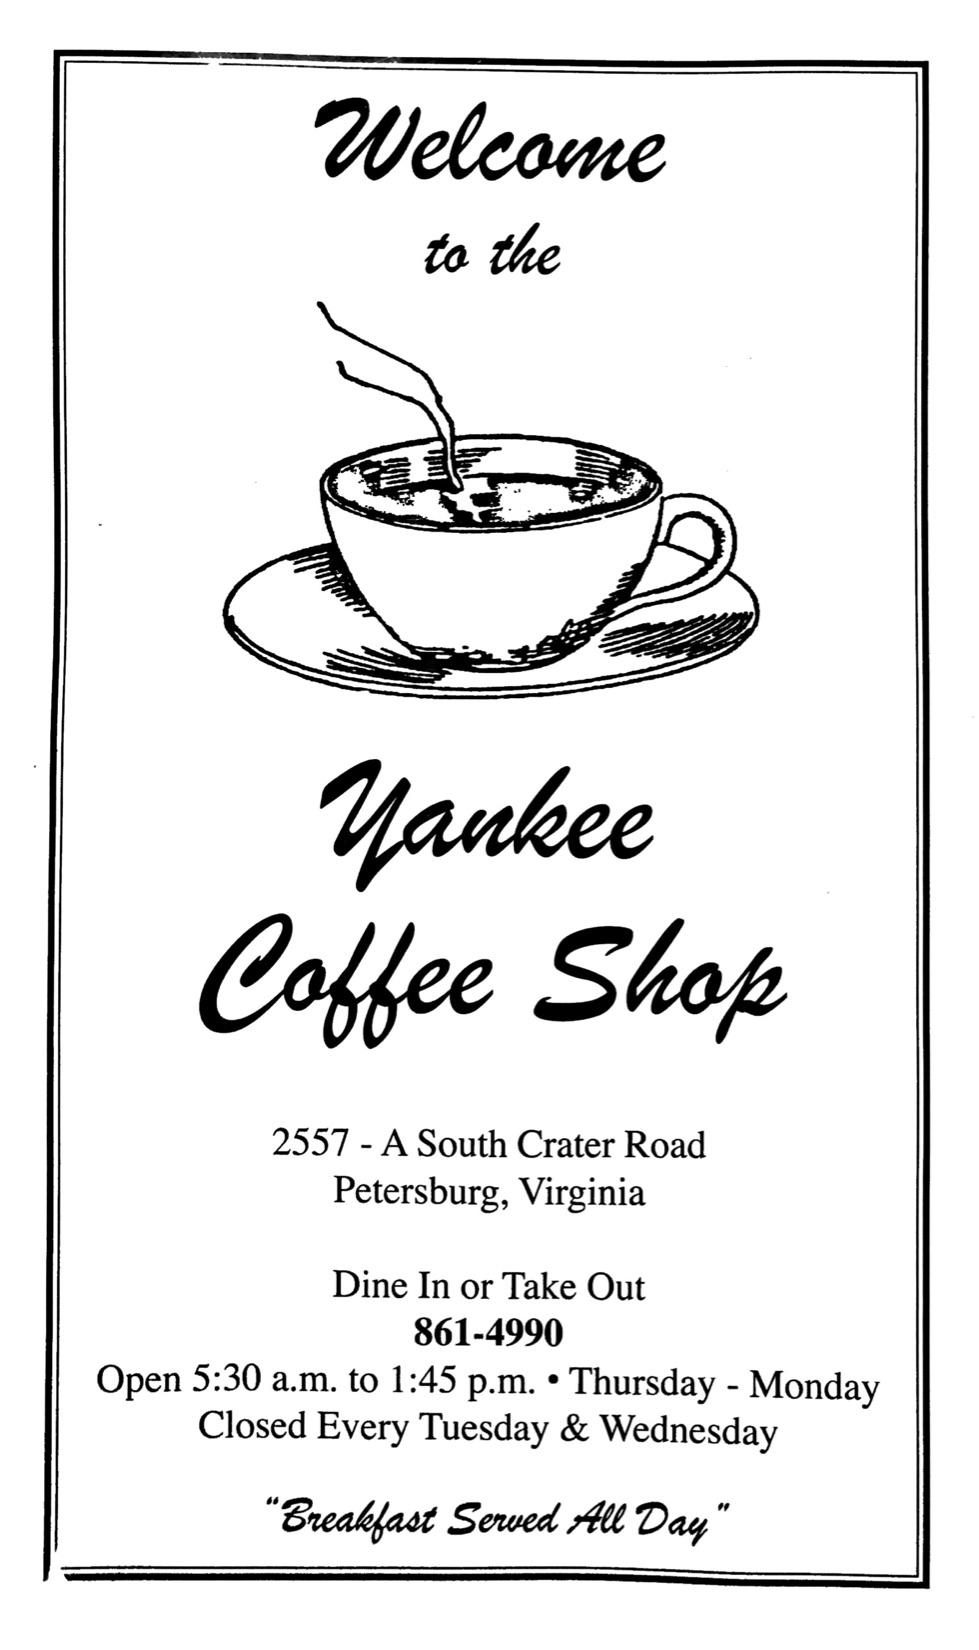 Yankee Coffee Shop's menu, page 1.